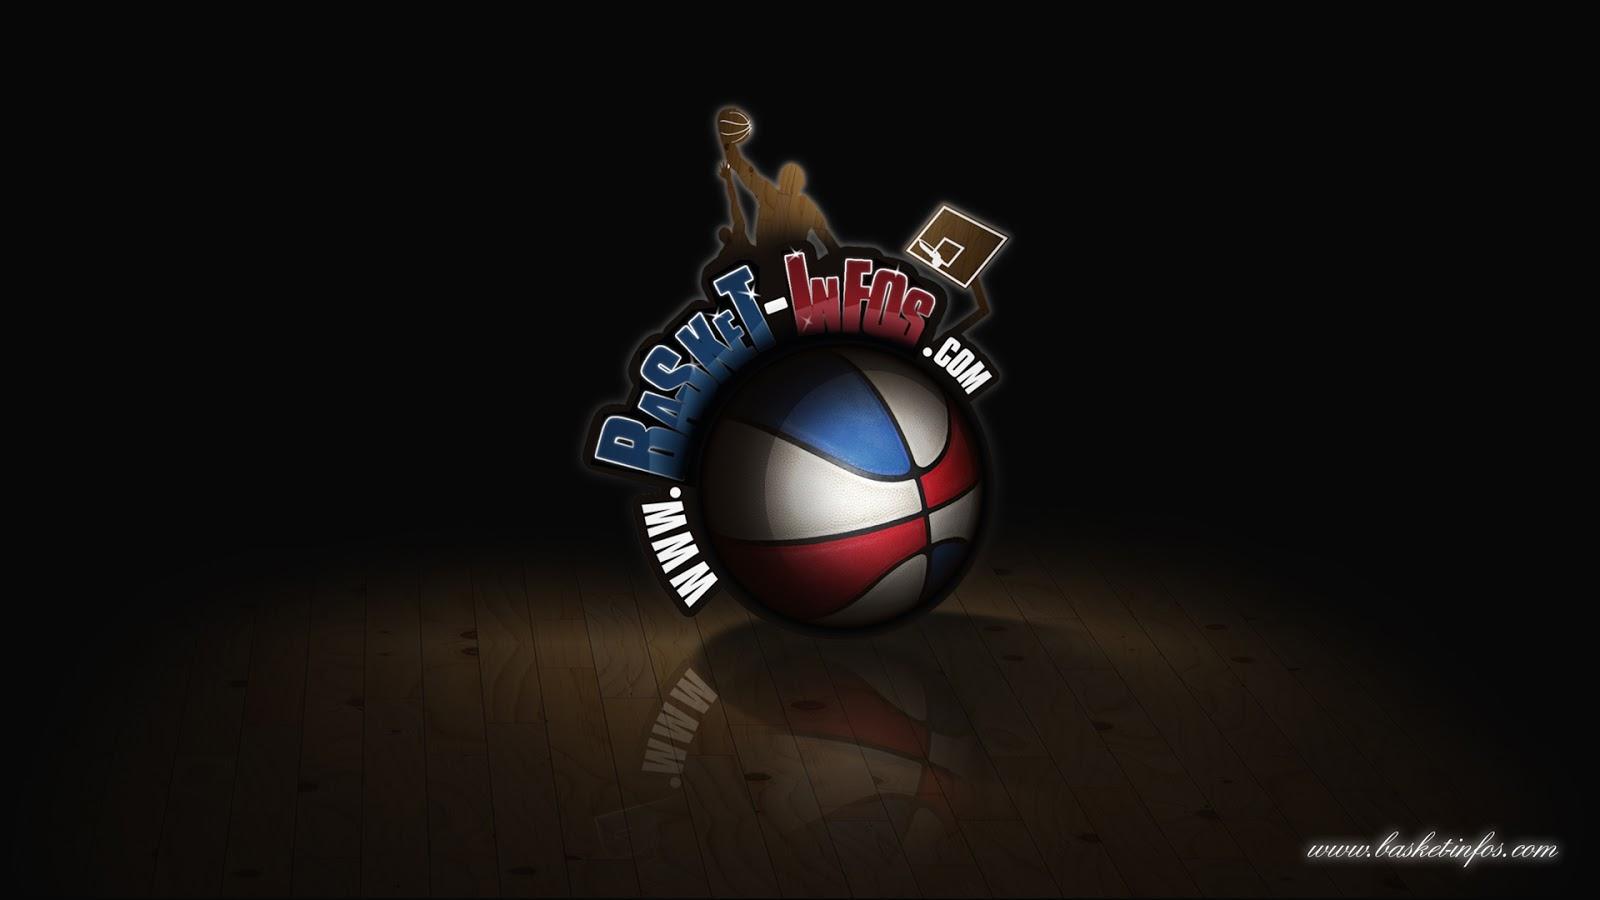 Lebron James Iphone Wallpaper Fond D 233 Cran Basketball Hd Gratuit Fond D 233 Cran Hd